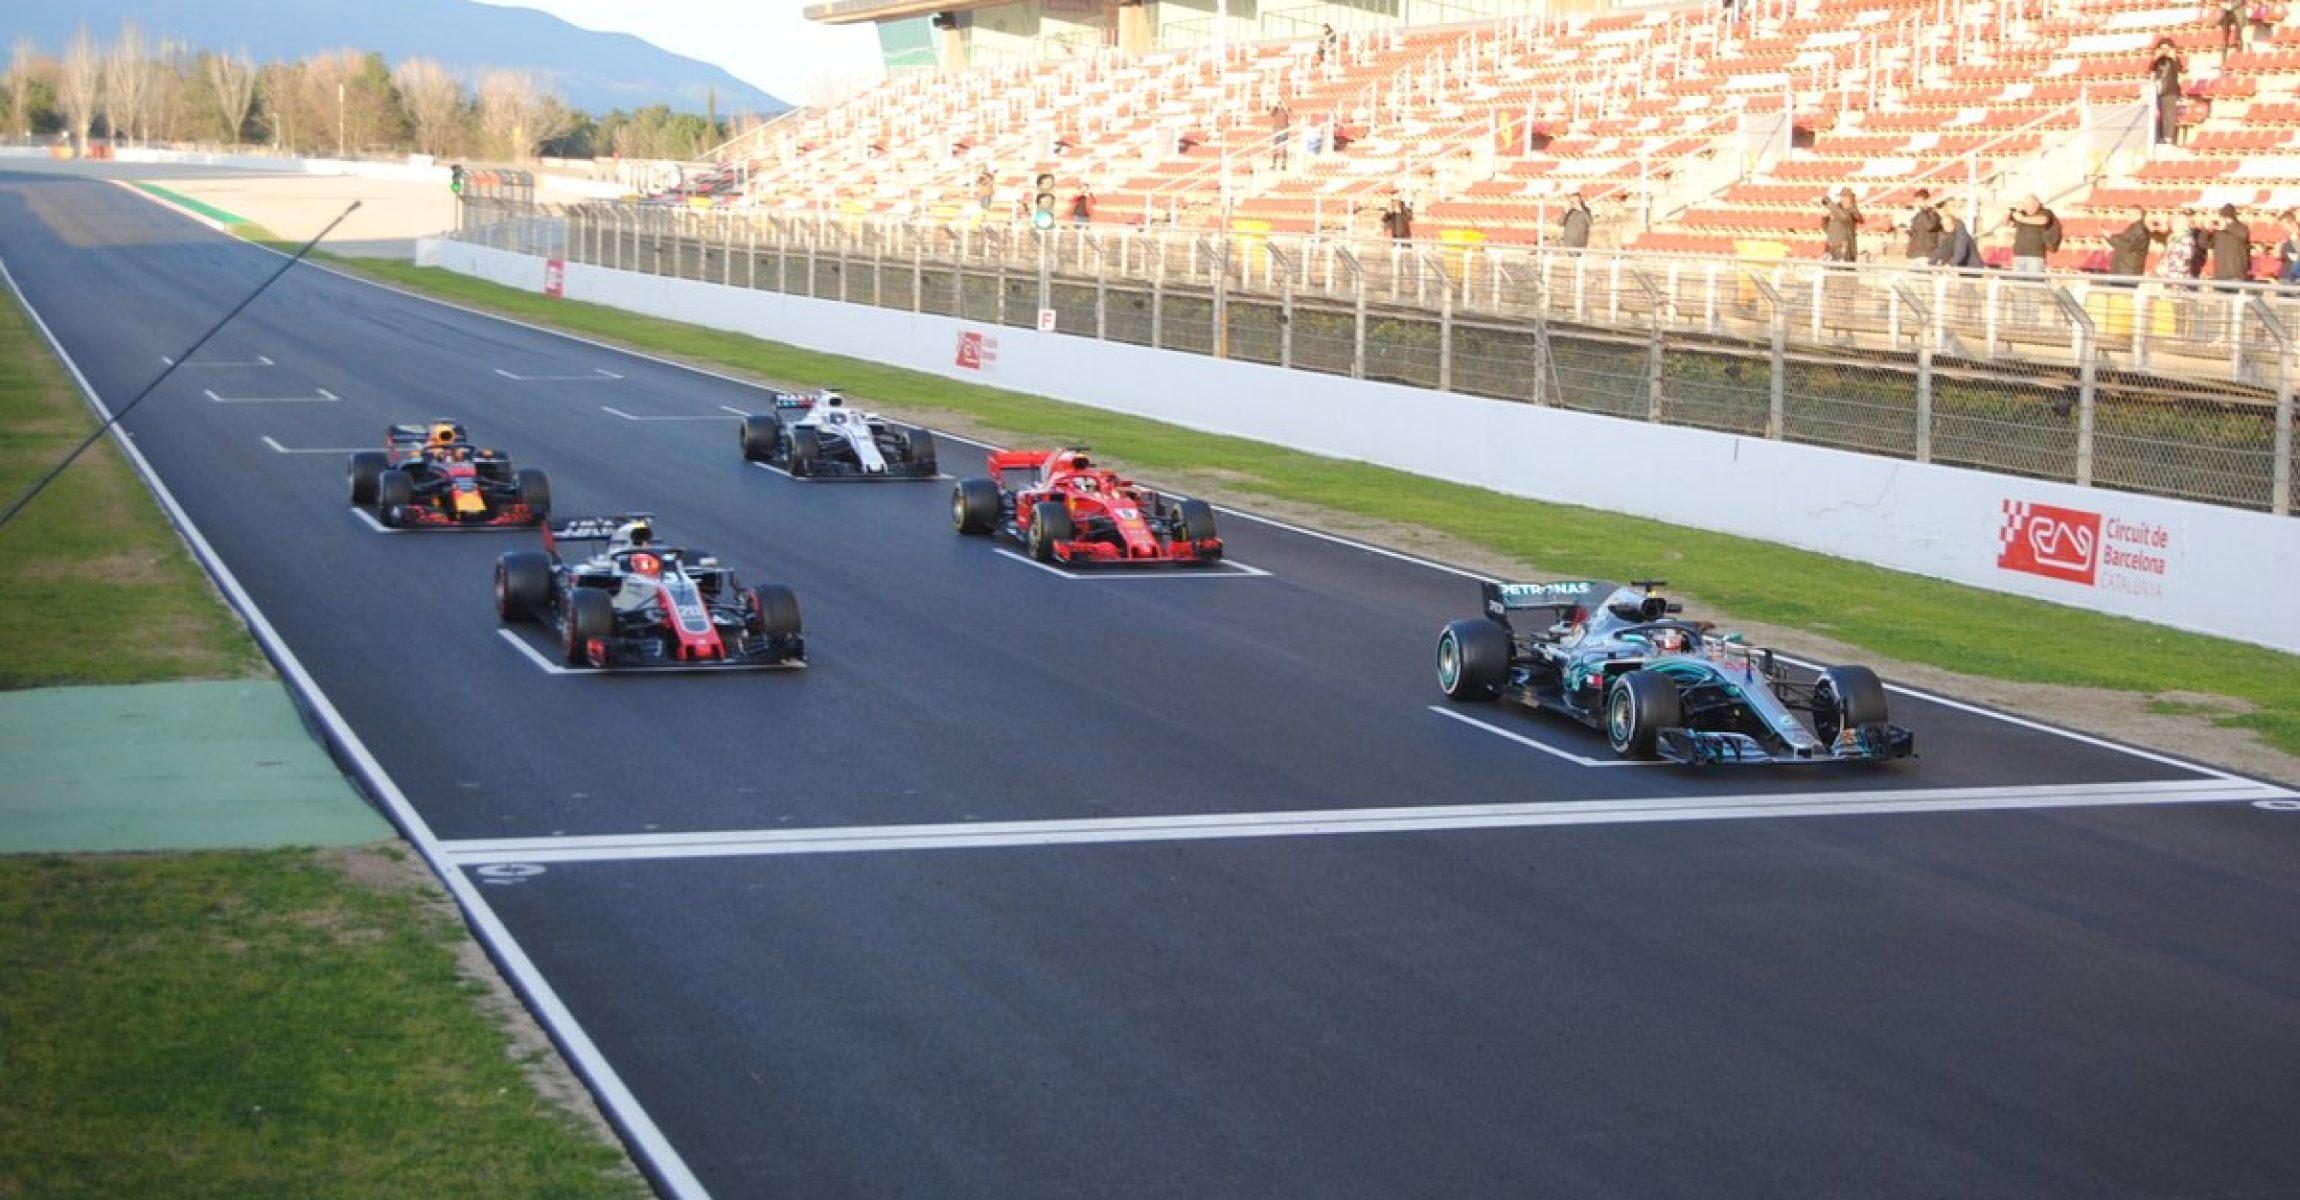 Fotó: Circuit de Catalunya-Barcelona